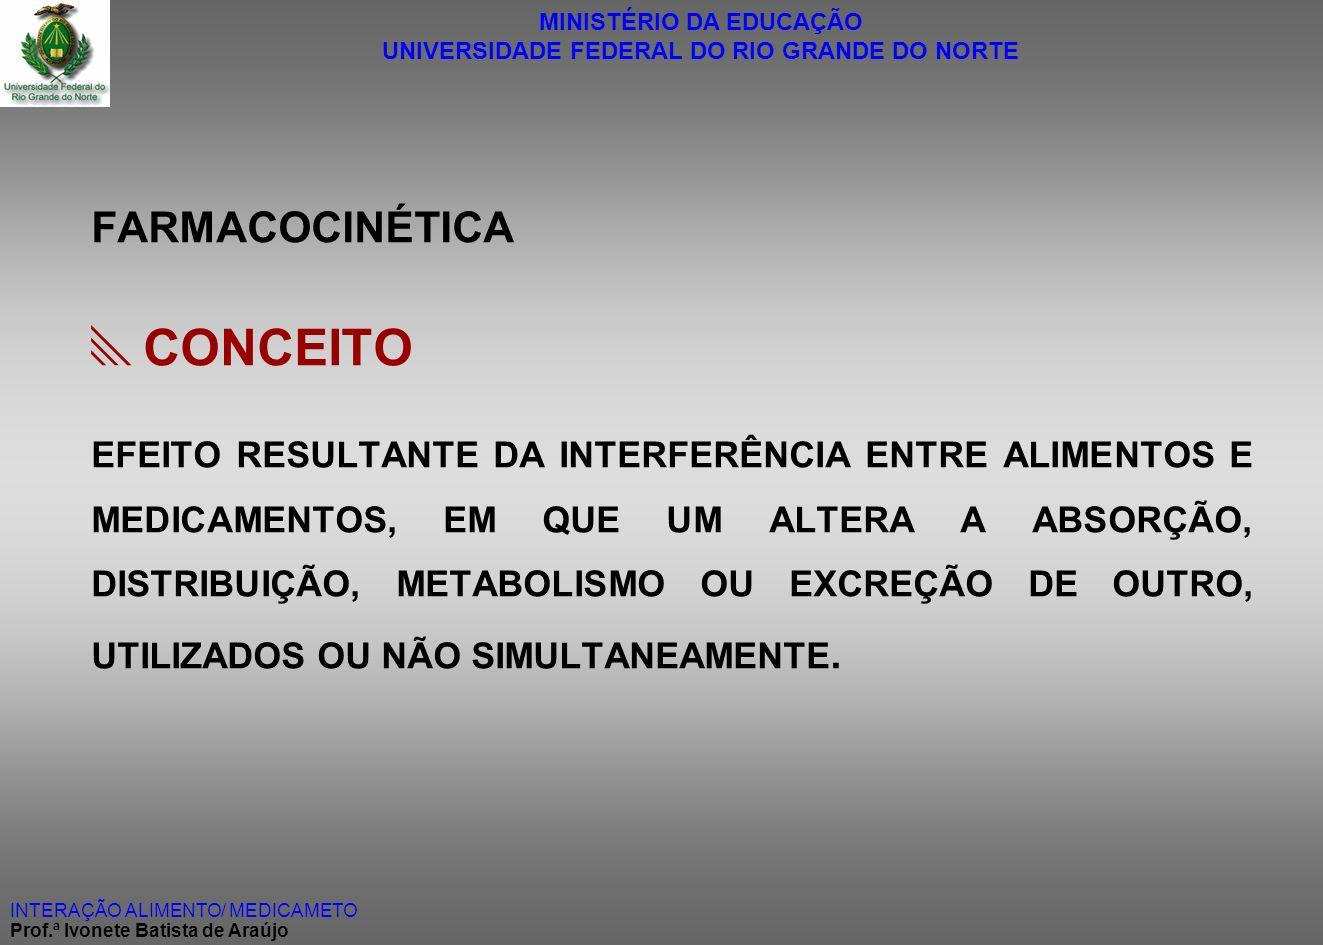 CONCEITO FARMACOCINÉTICA